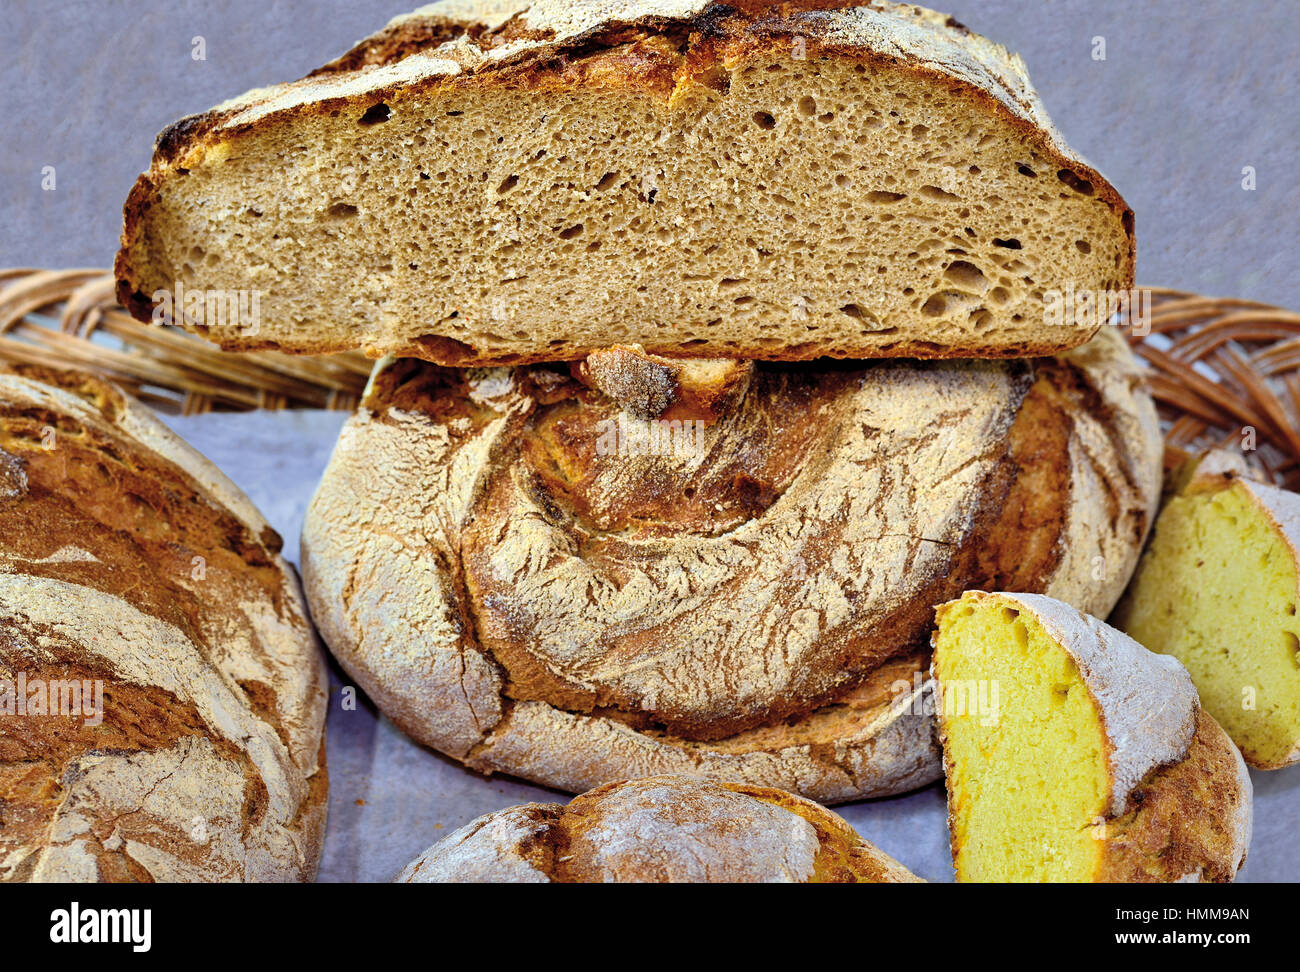 Traditionelle Bauern Brot Stockbild